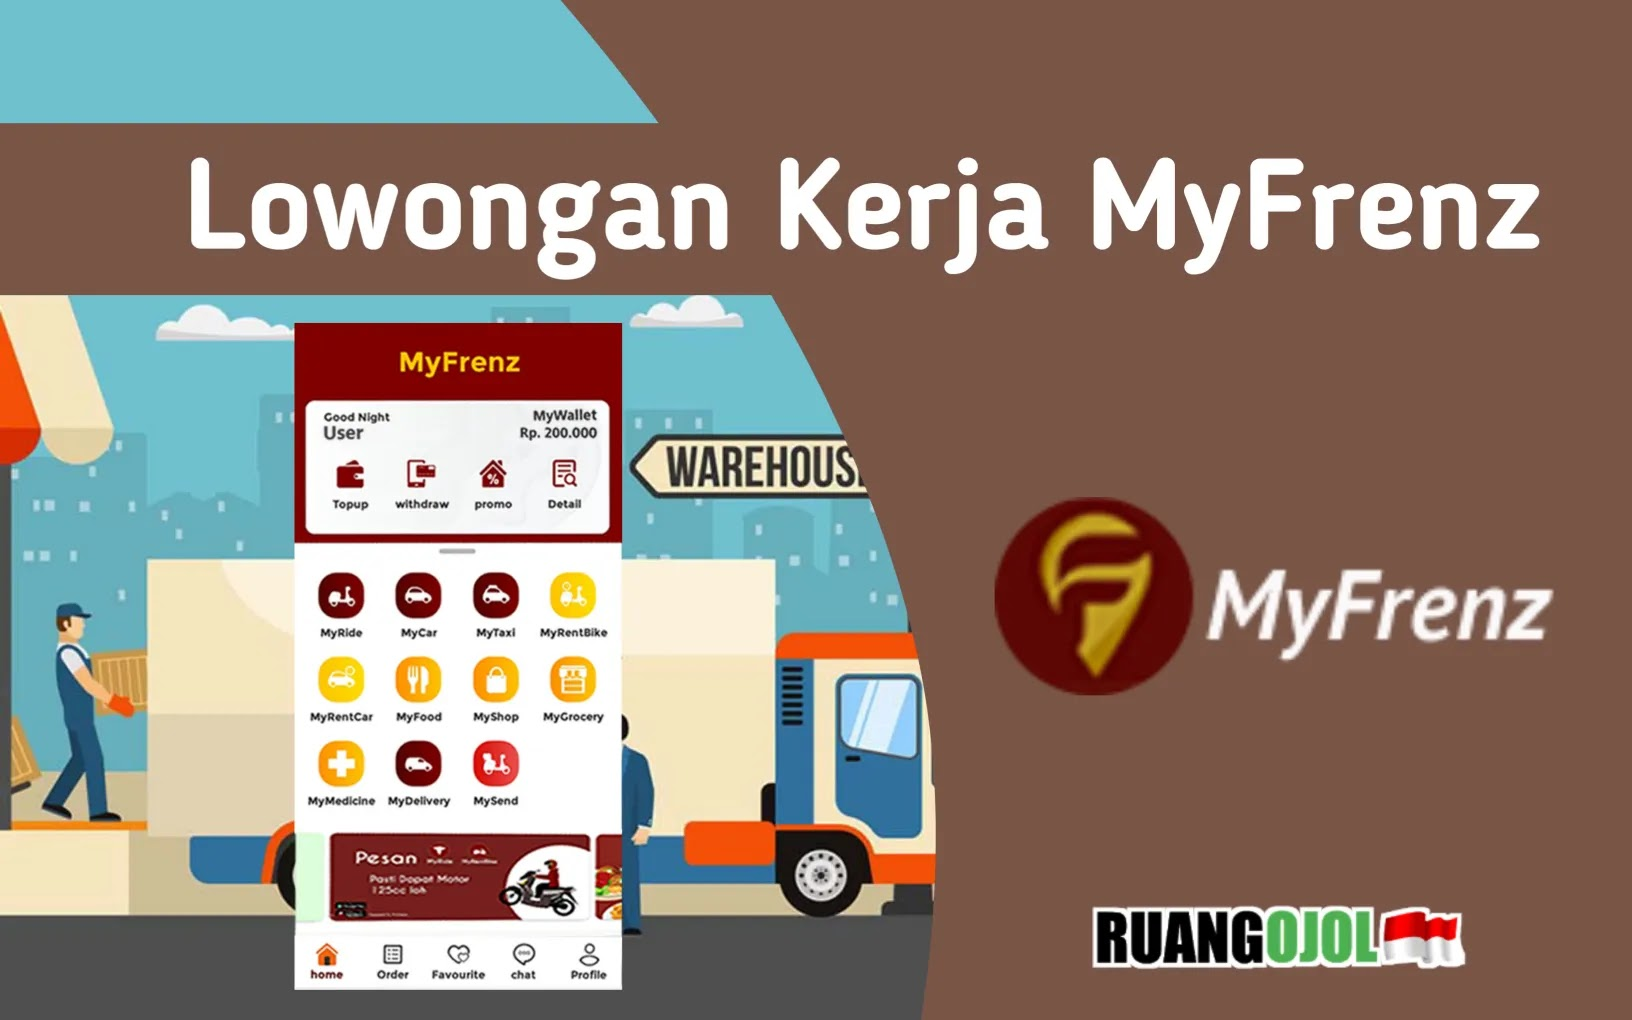 MyFrenz